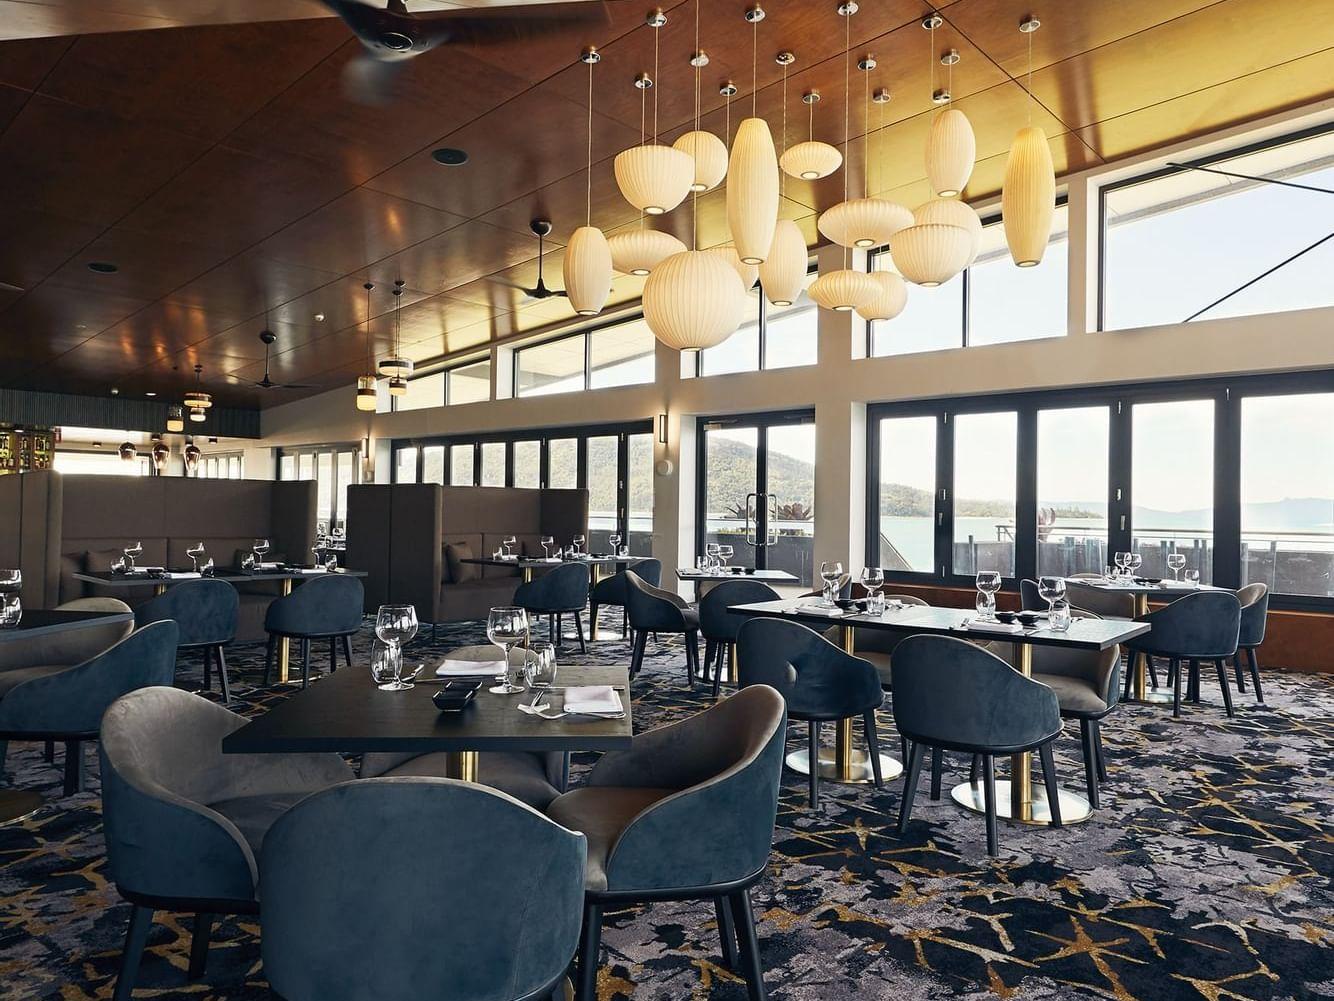 Infinity Restaurant dining area at Daydream Island Resort